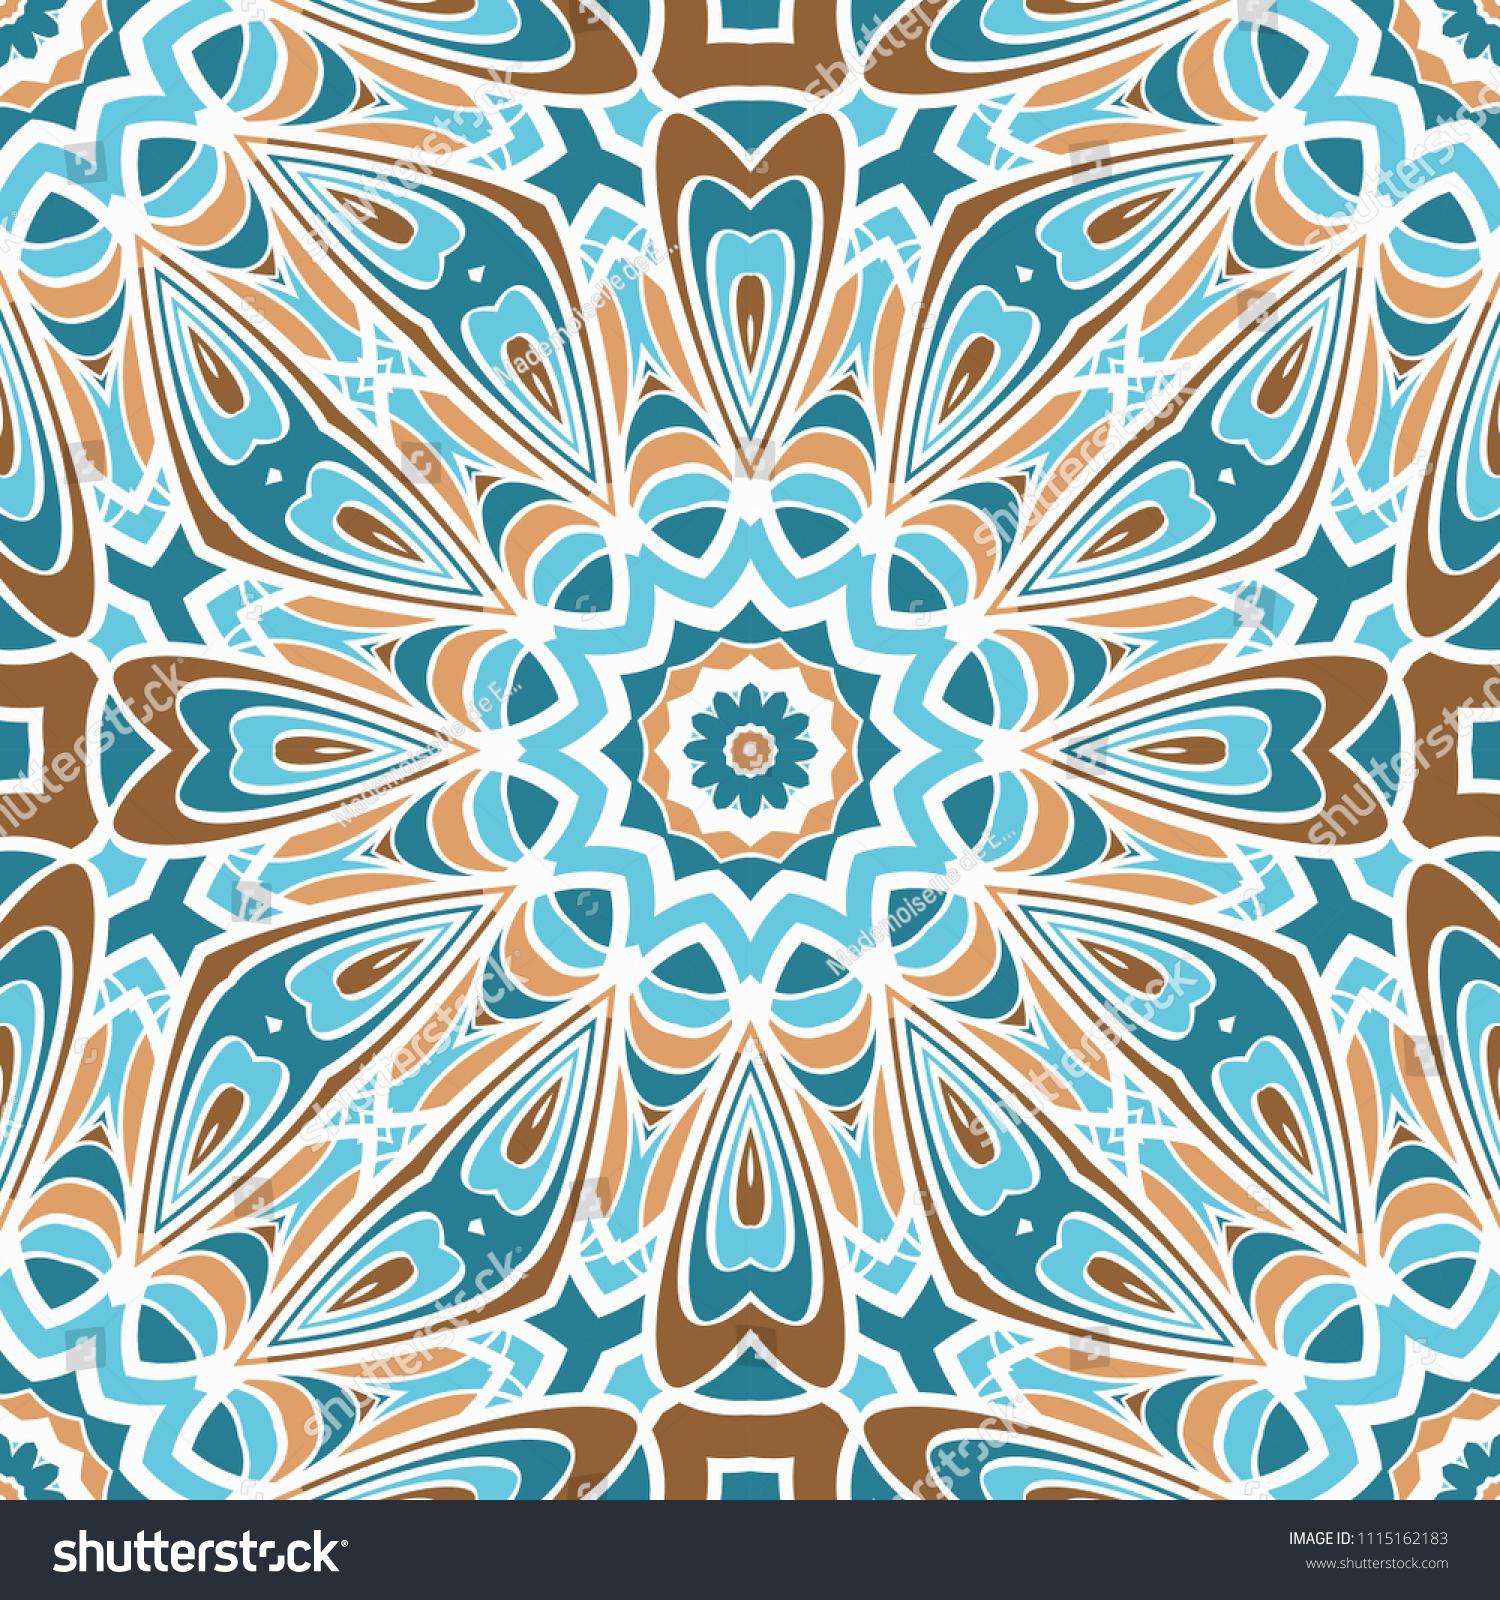 Artdeco Floral Pattern Seamless Vector Illustration Stock Vector